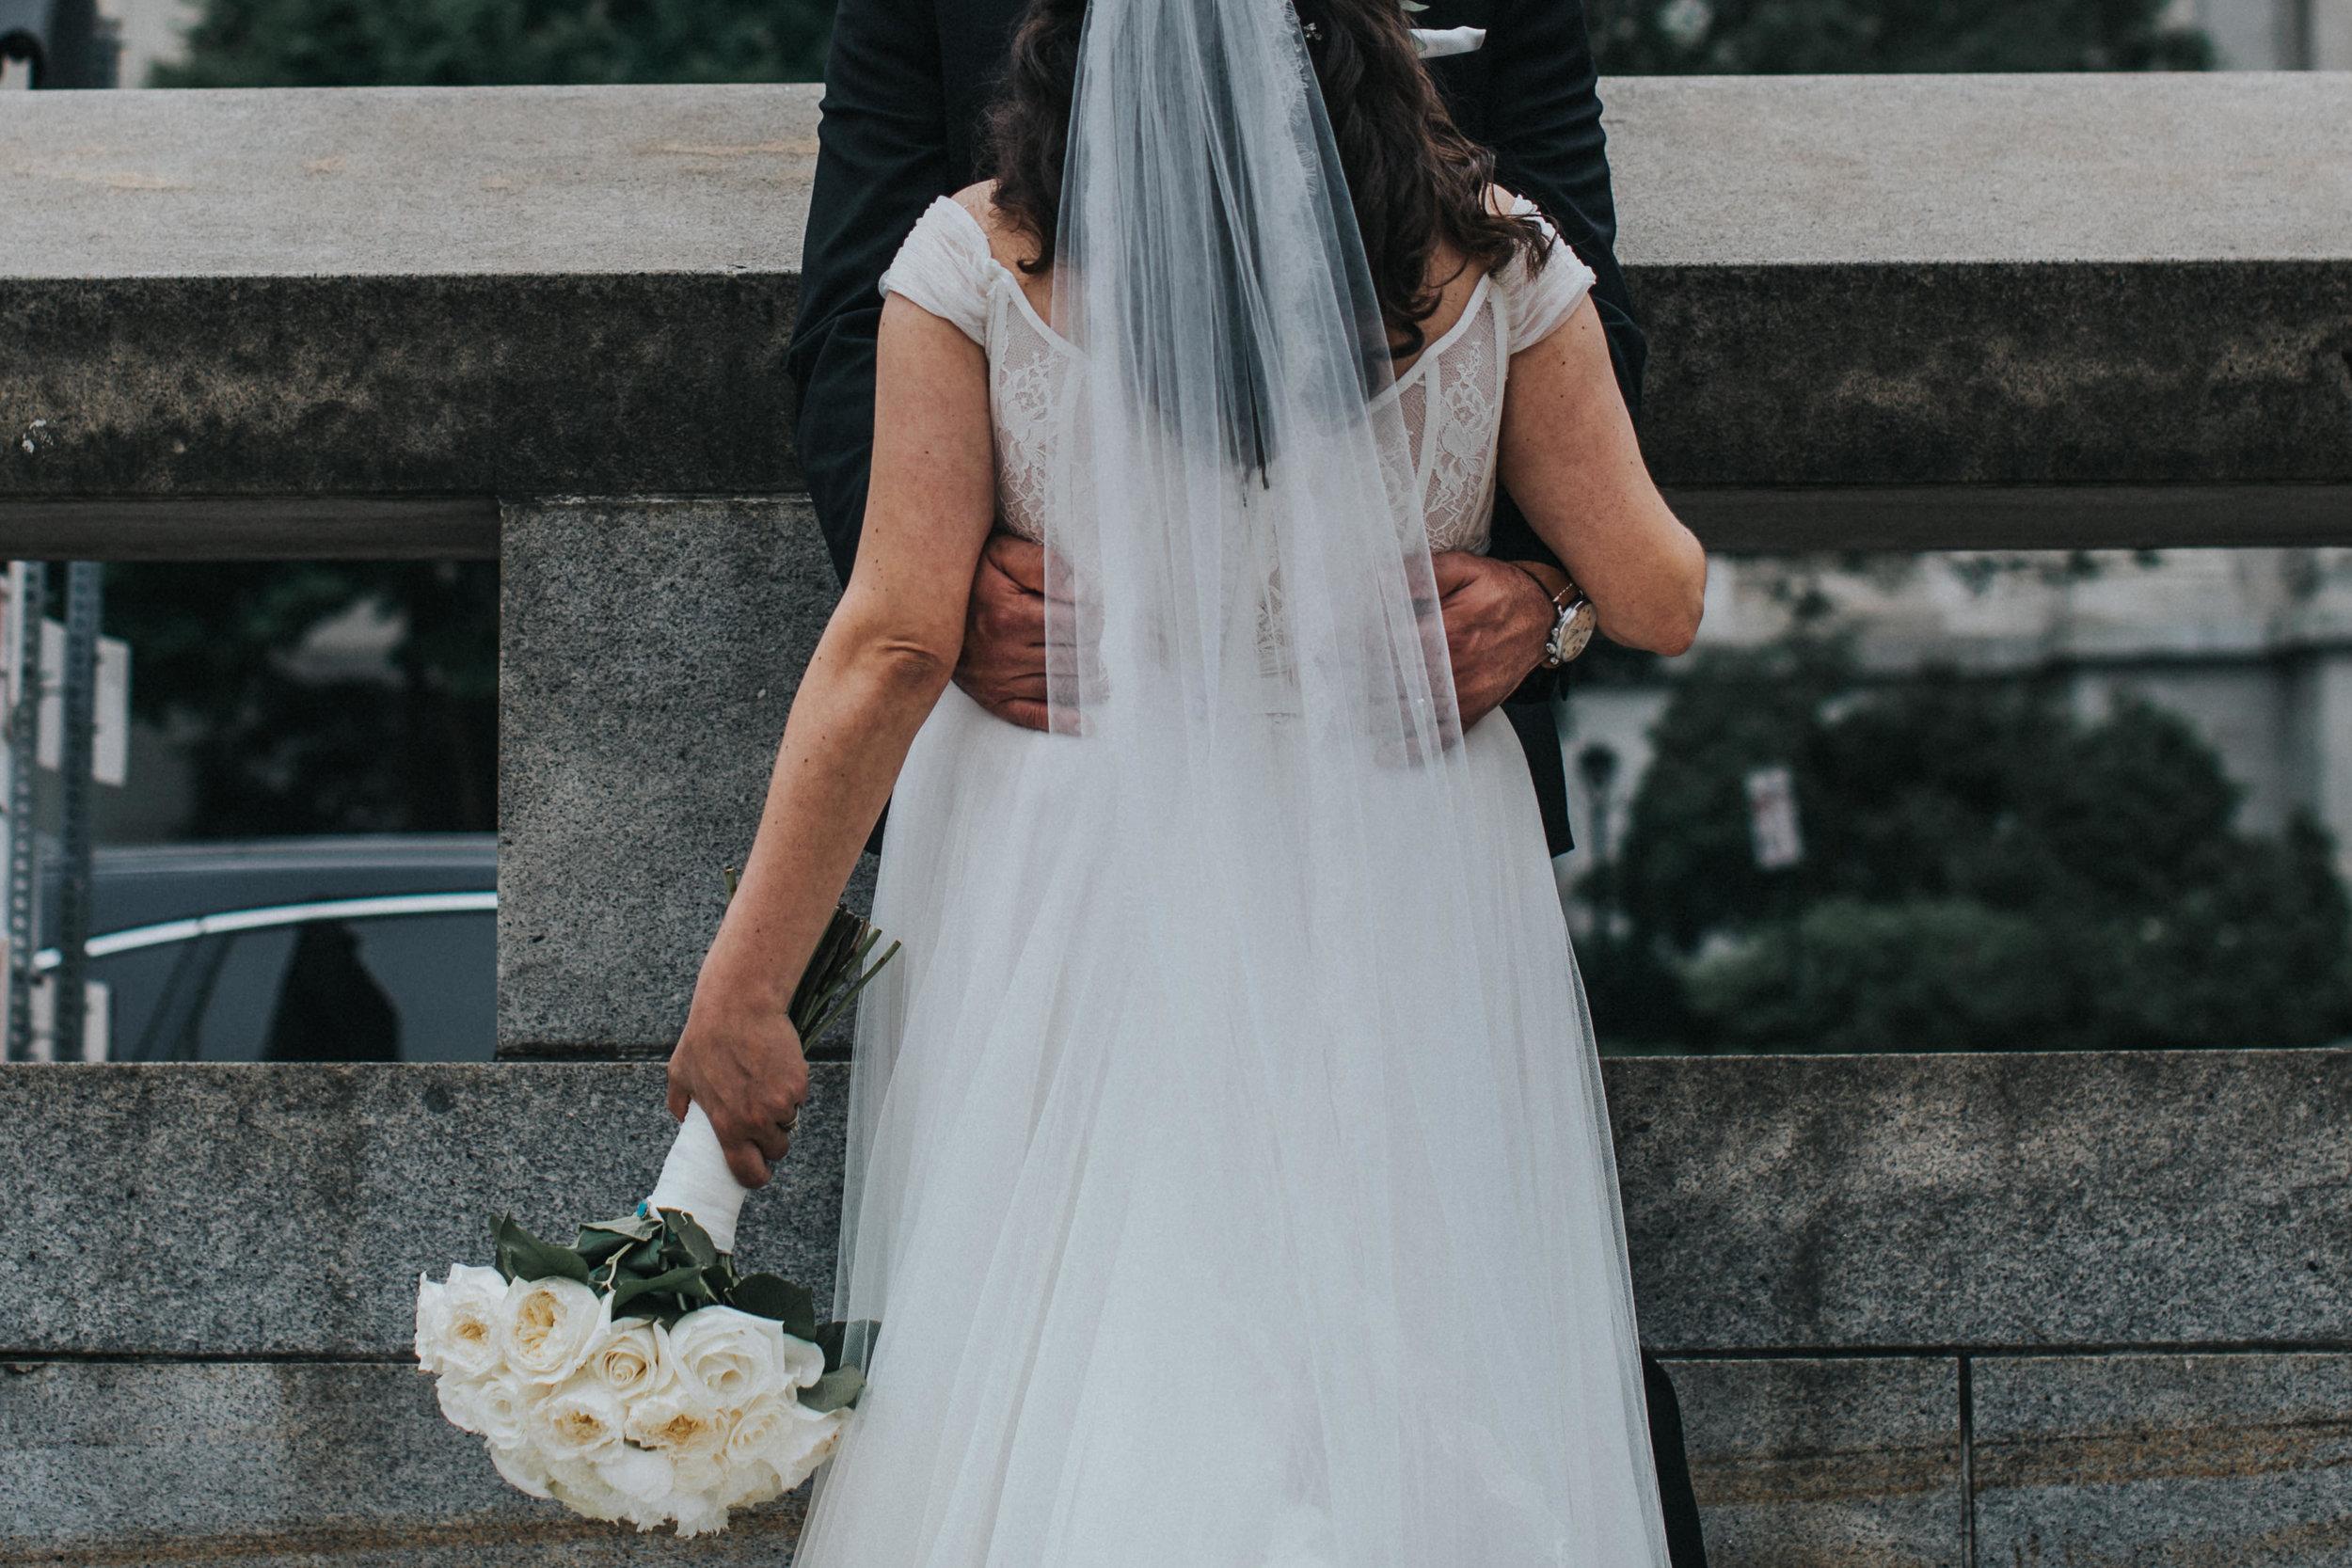 JennaLynnPhotography-NJWeddingPhotographer-Philadelphia-Wedding-ArtsBallroom-BridalParty-36.jpg